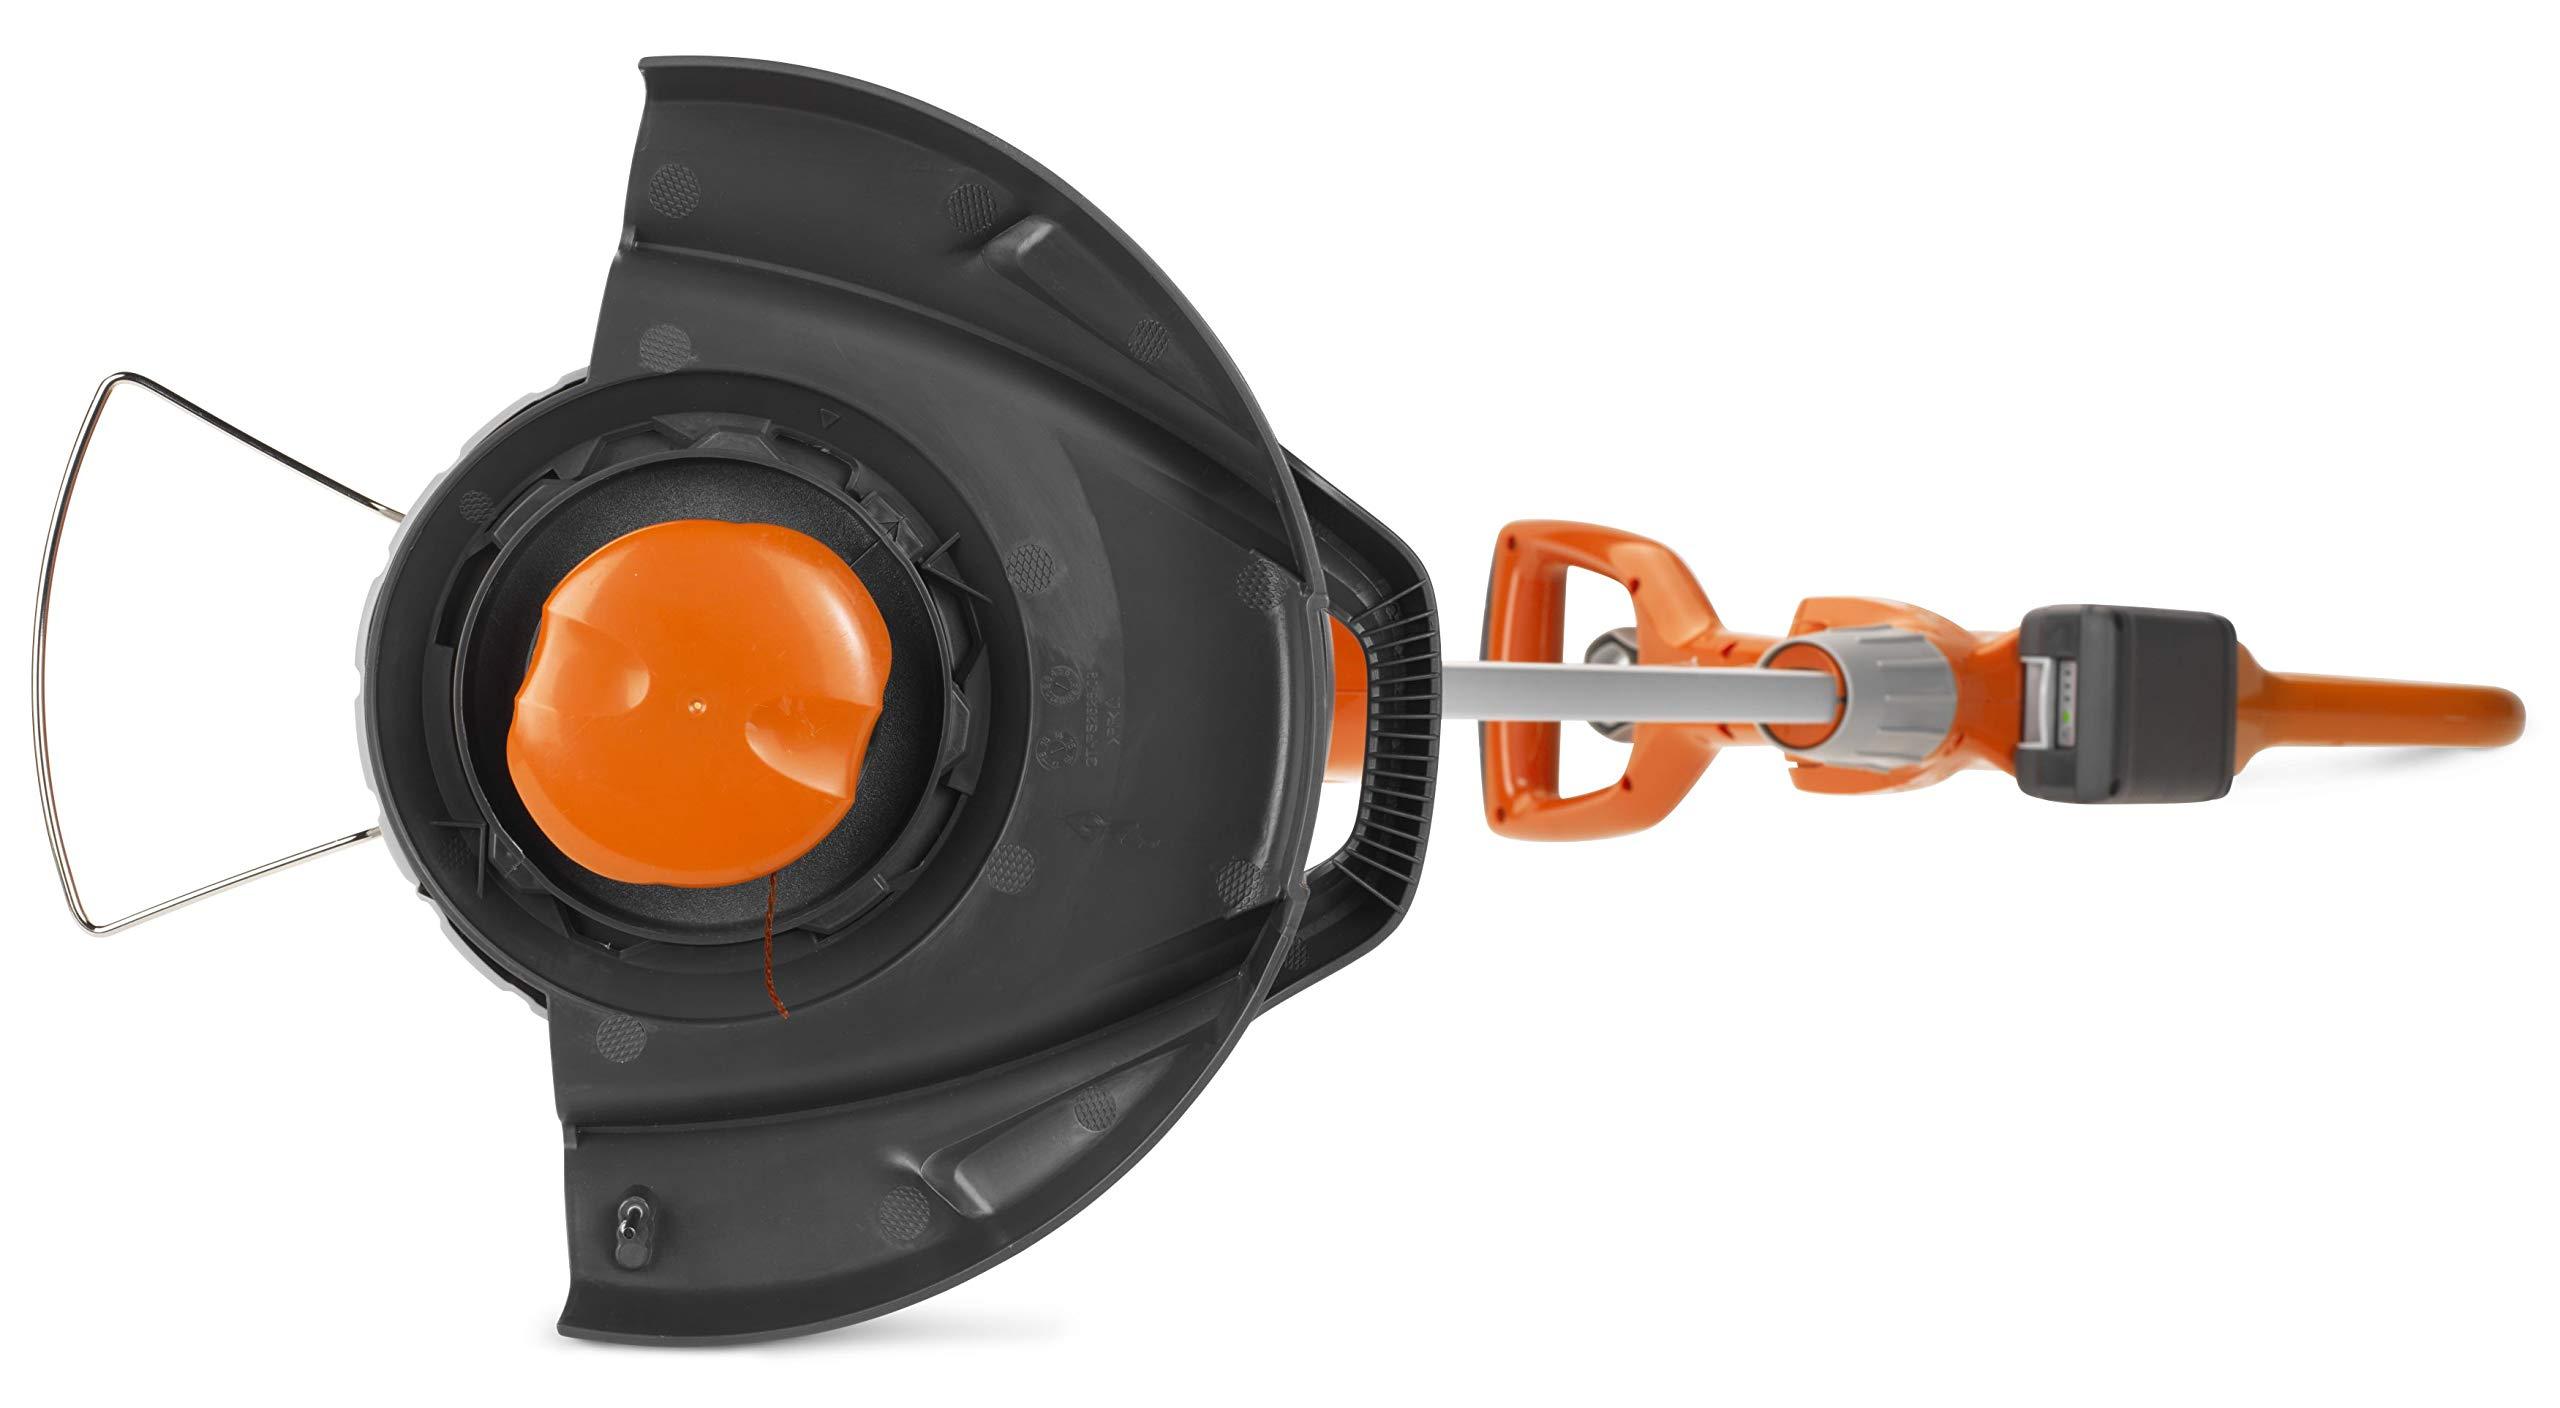 Flymo Contour Cordless 20V Li Grass Trimmer, 20V Li-Ion Battery, 25cm Cutting Width